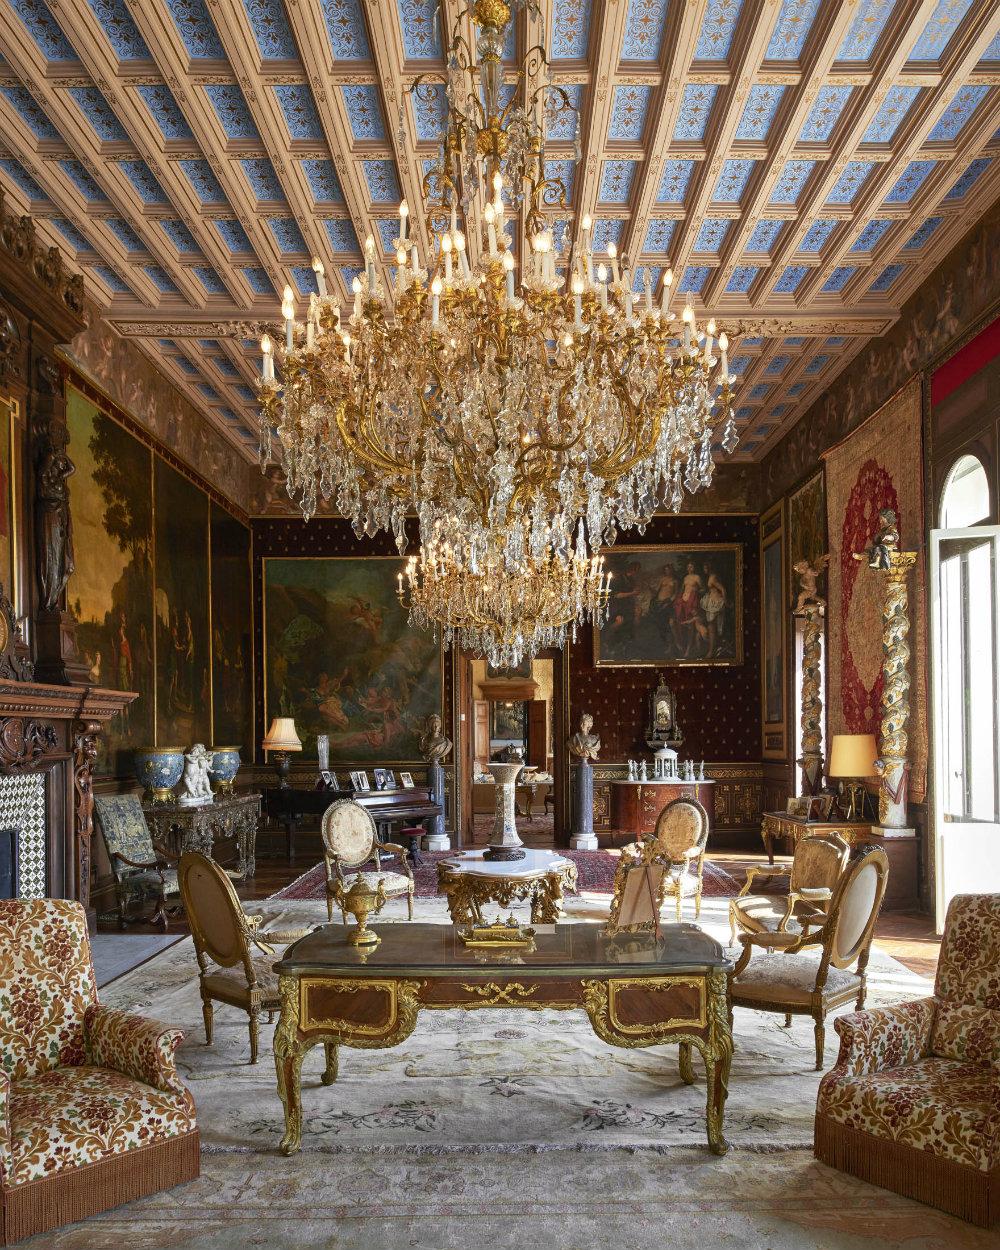 10 expensive house interior design